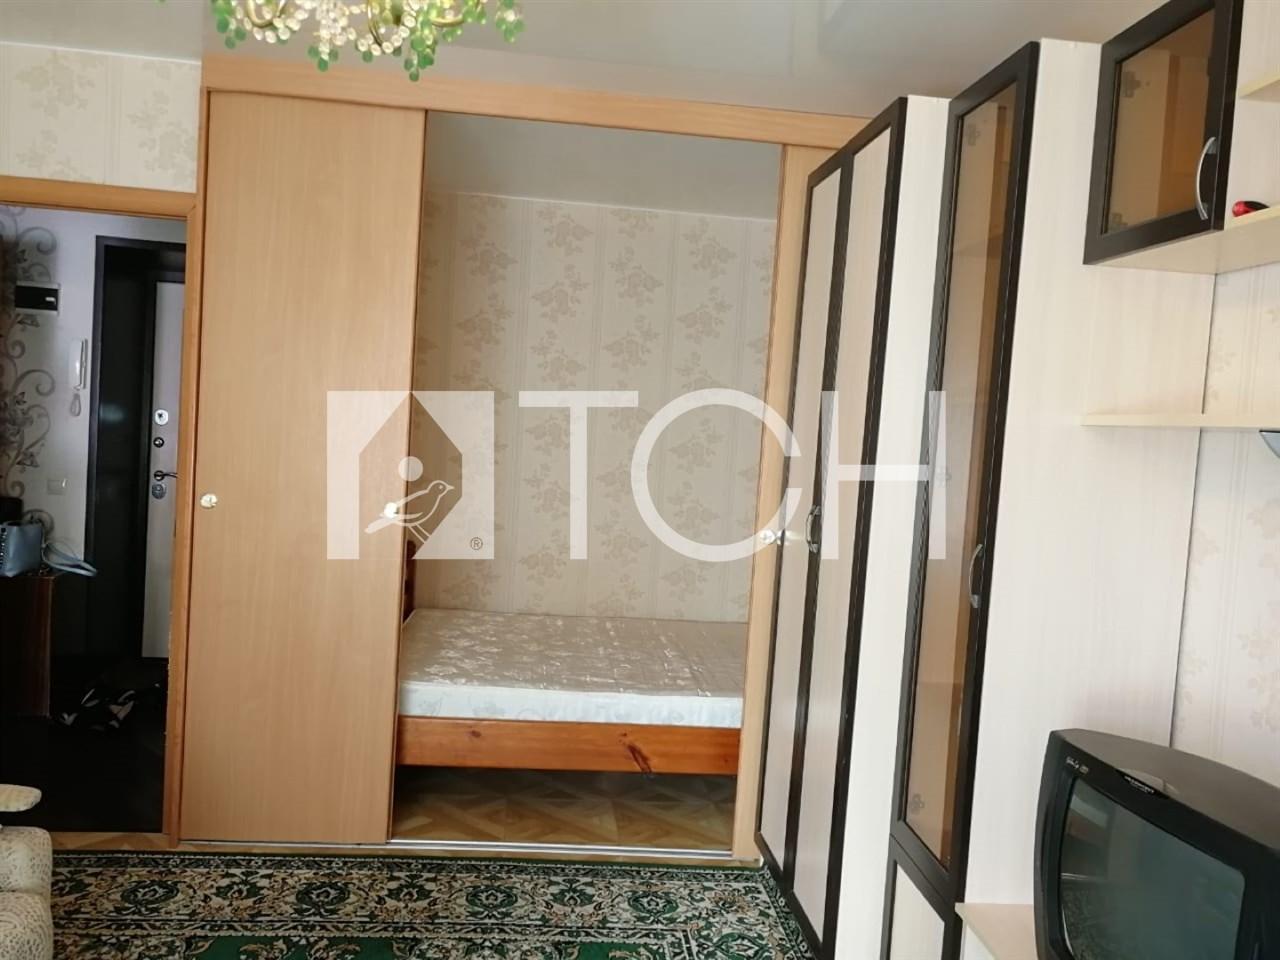 Квартира, 1 комната, 35 м² в Щелково 89261425000 купить 5